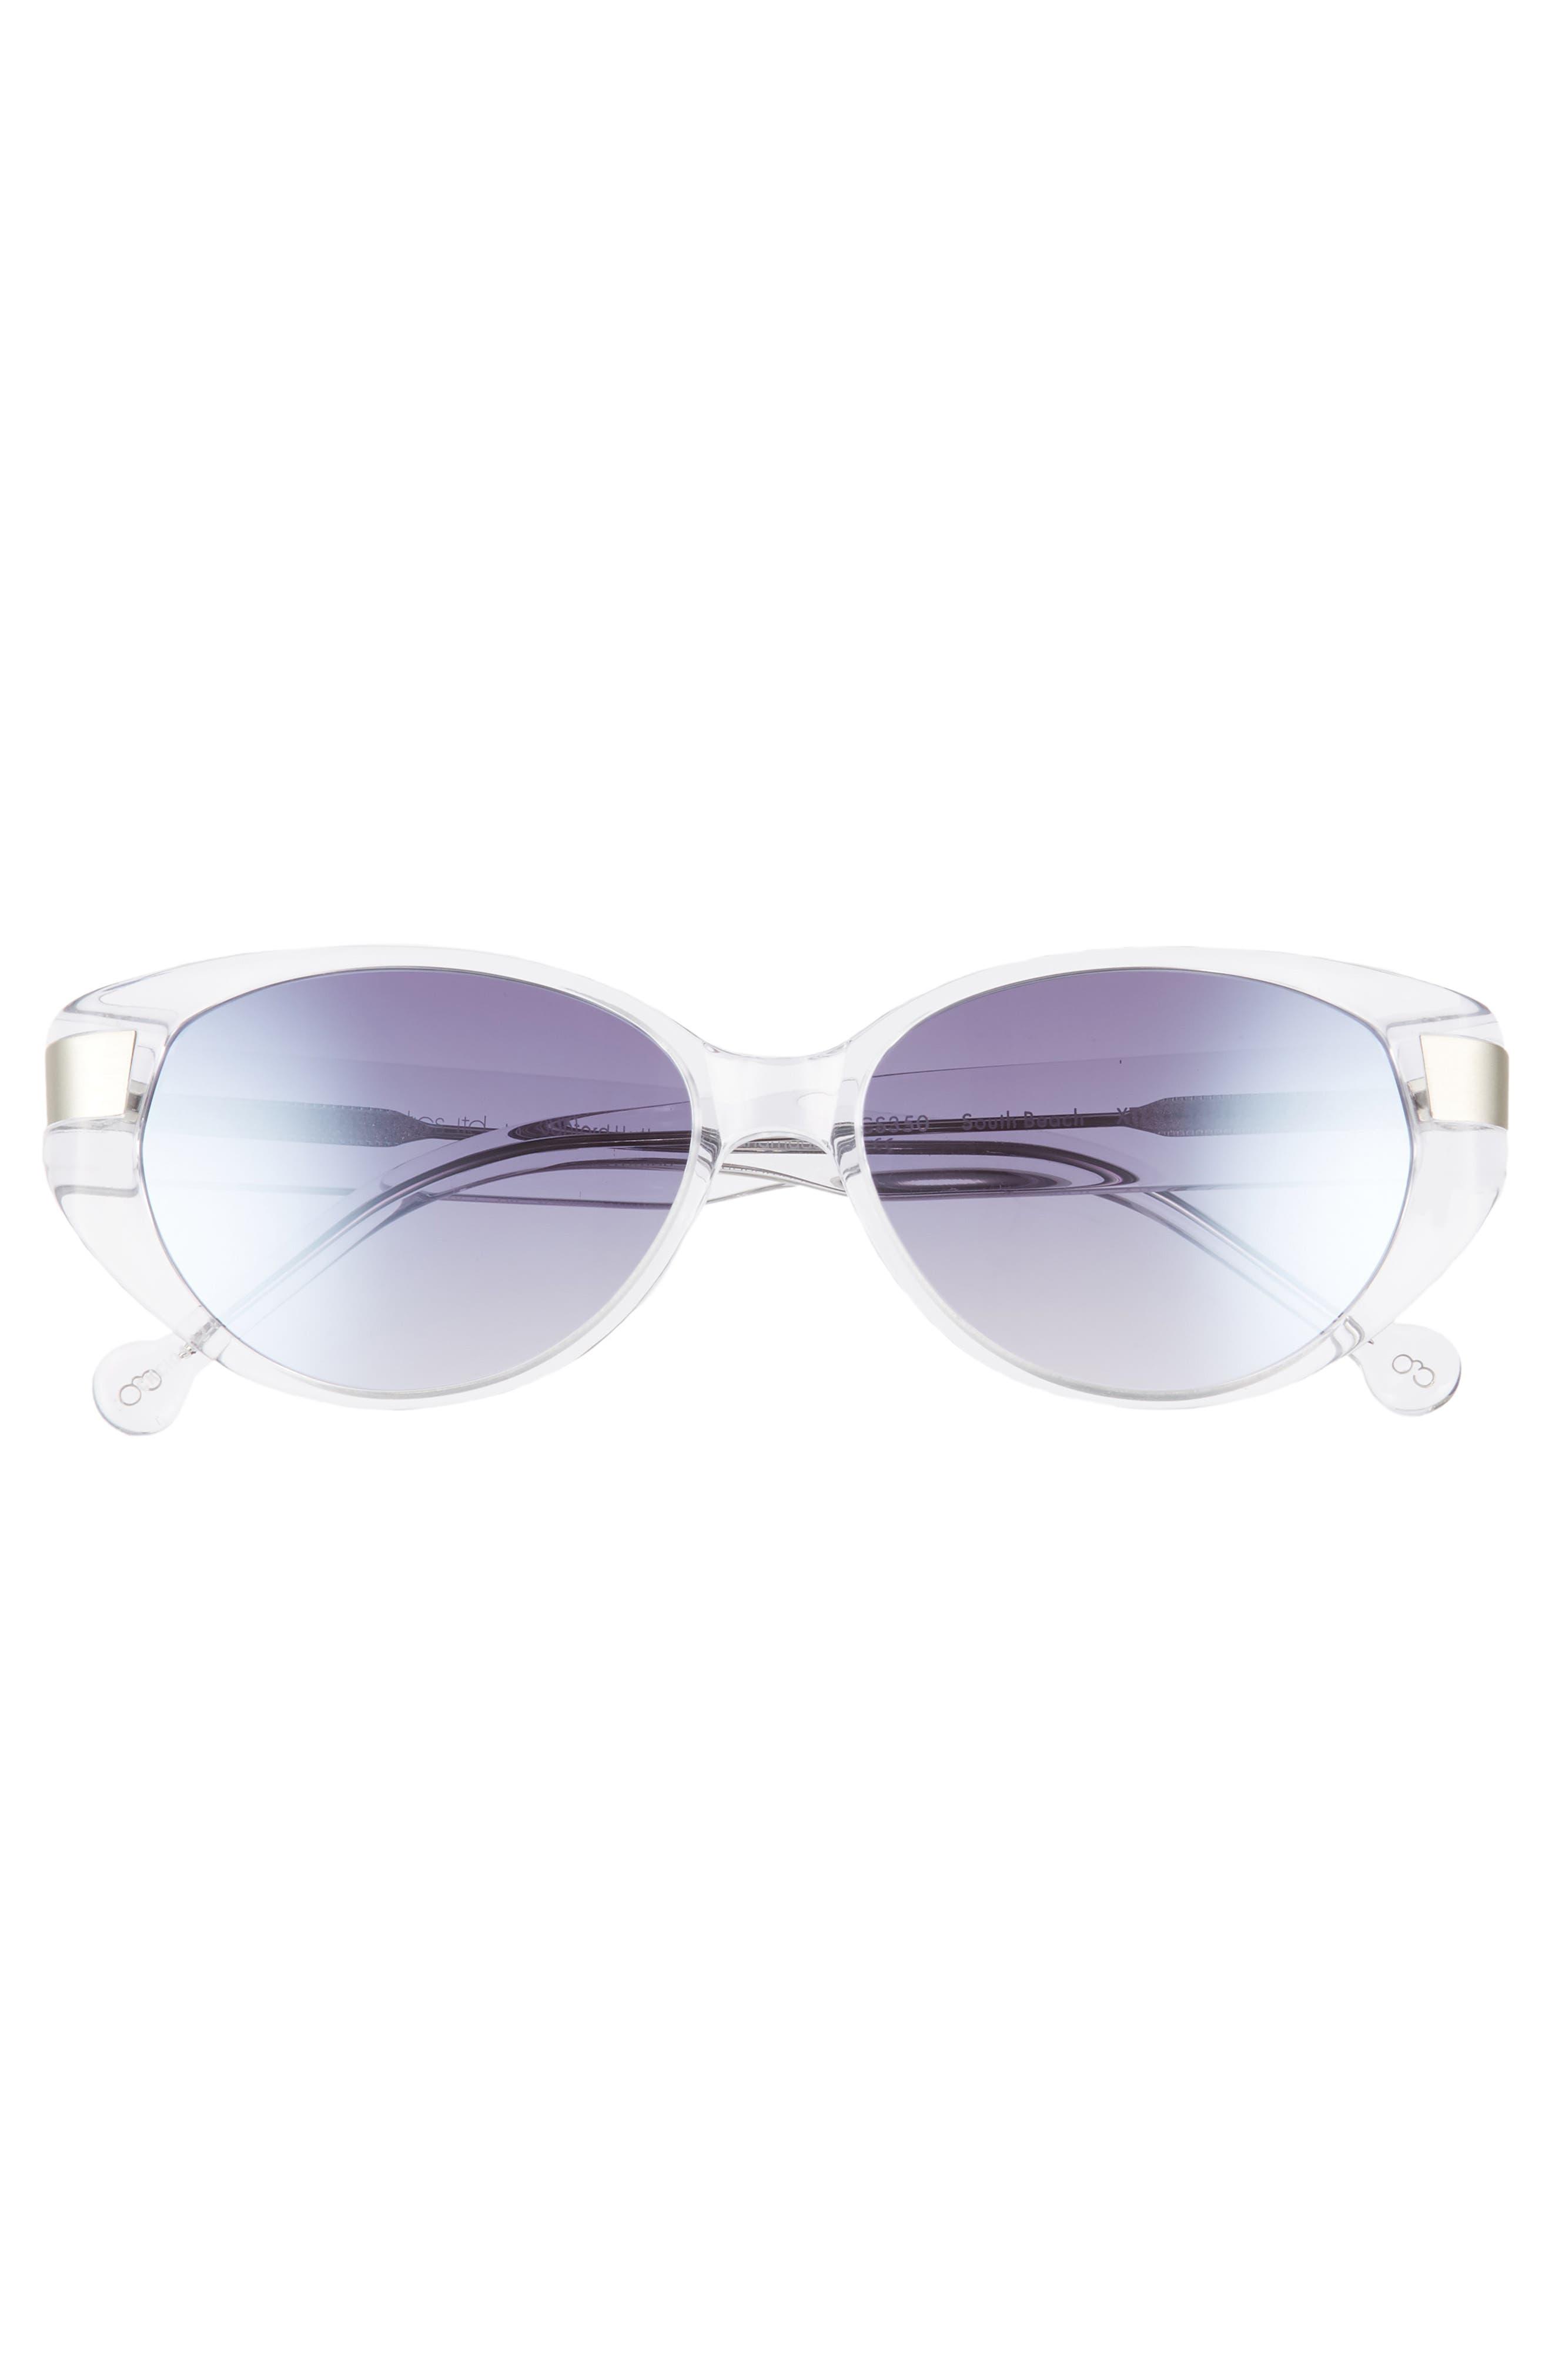 Southbeach 54mm Gradient Cat Eye Sunglasses,                             Alternate thumbnail 3, color,                             CRYSTAL